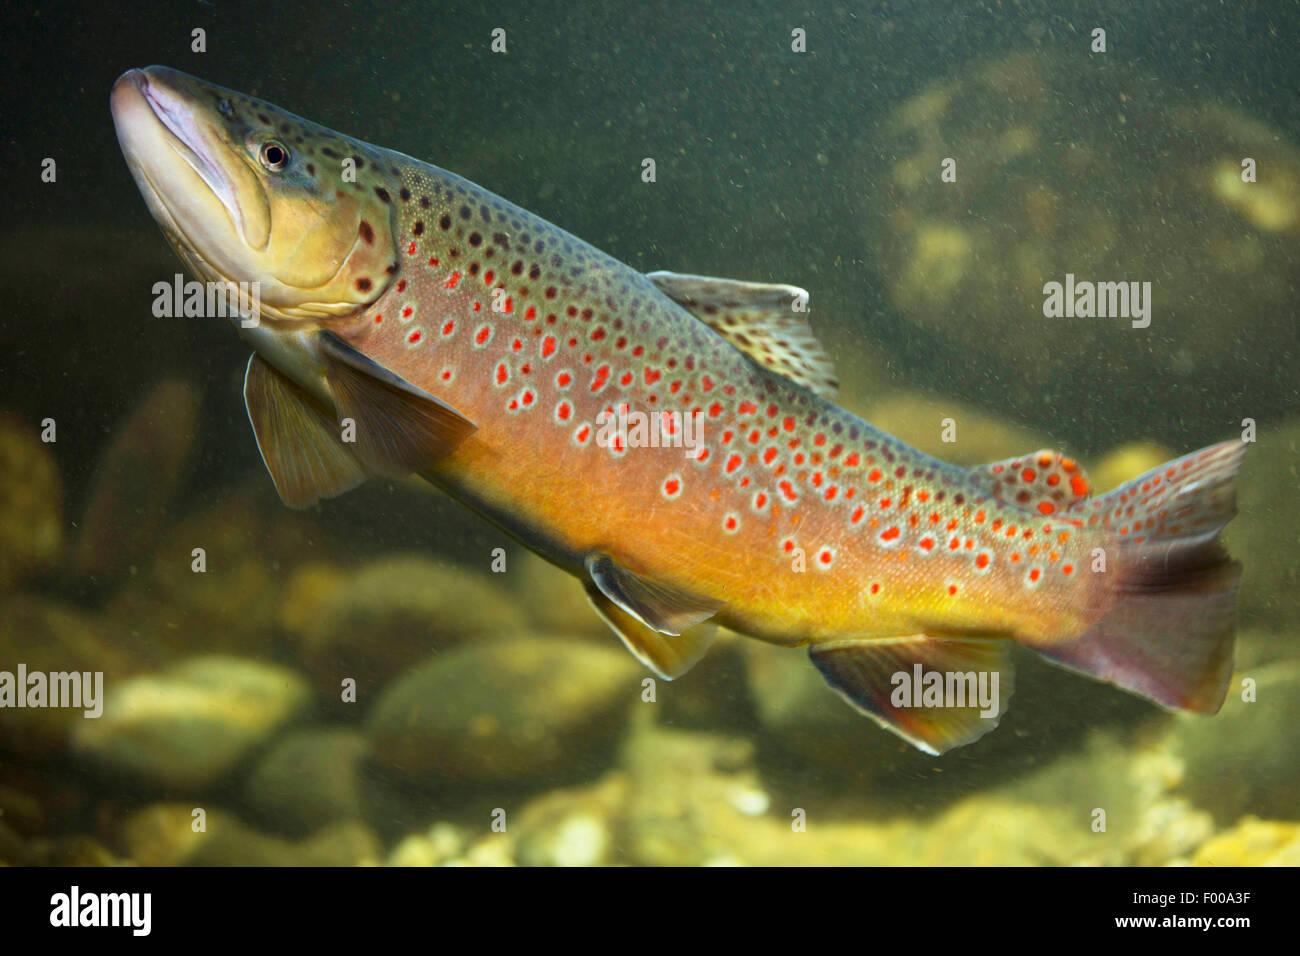 brown trout, river trout, brook trout (Salmo trutta fario), male , Germany, Bavaria - Stock Image